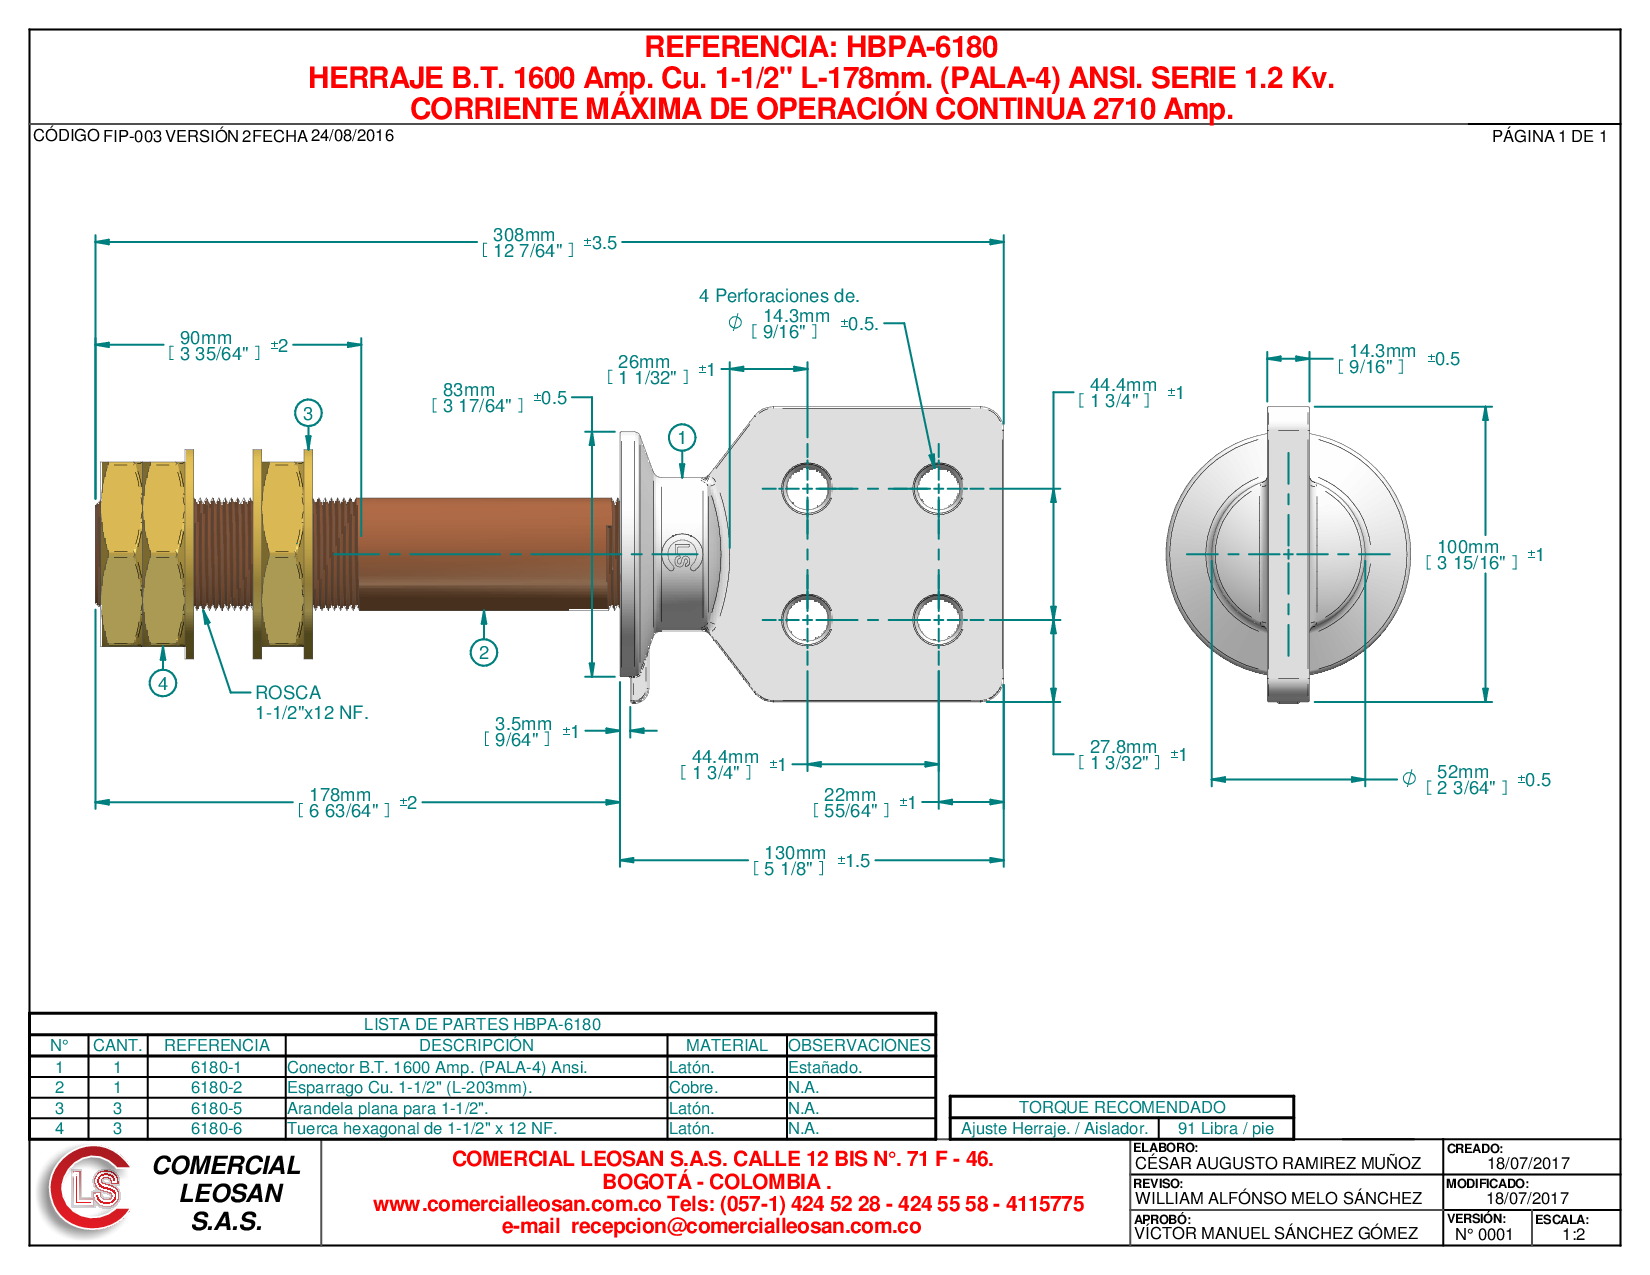 "HERRAJE B.T. 1600 Amp. Cu. 1-1/2"" L-178mm. (PALA-4) ANSI. SERIE 1.2 Kv."